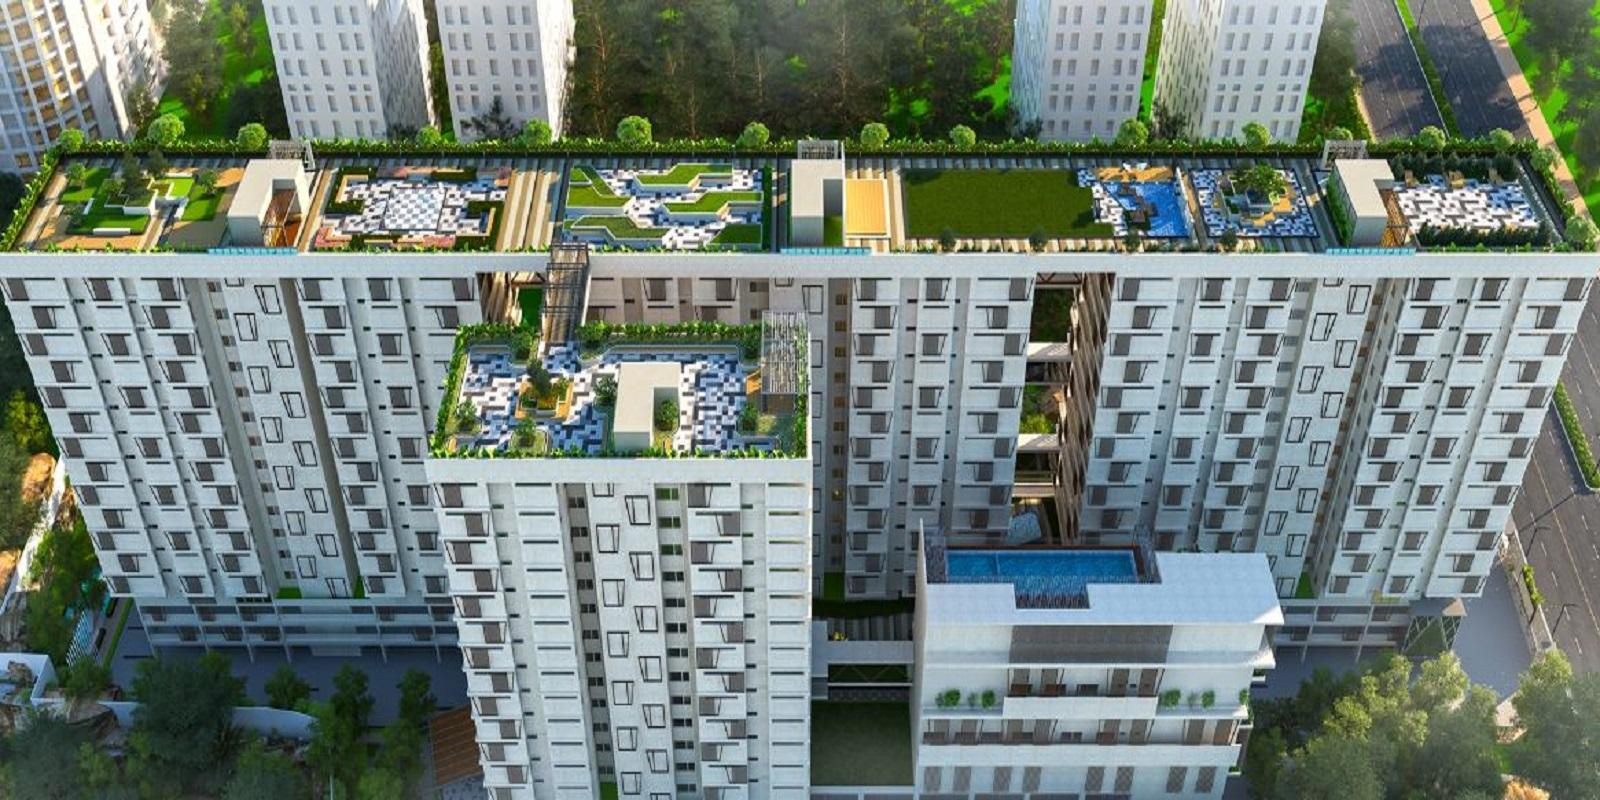 dsr ssc gvk skycity project large image2